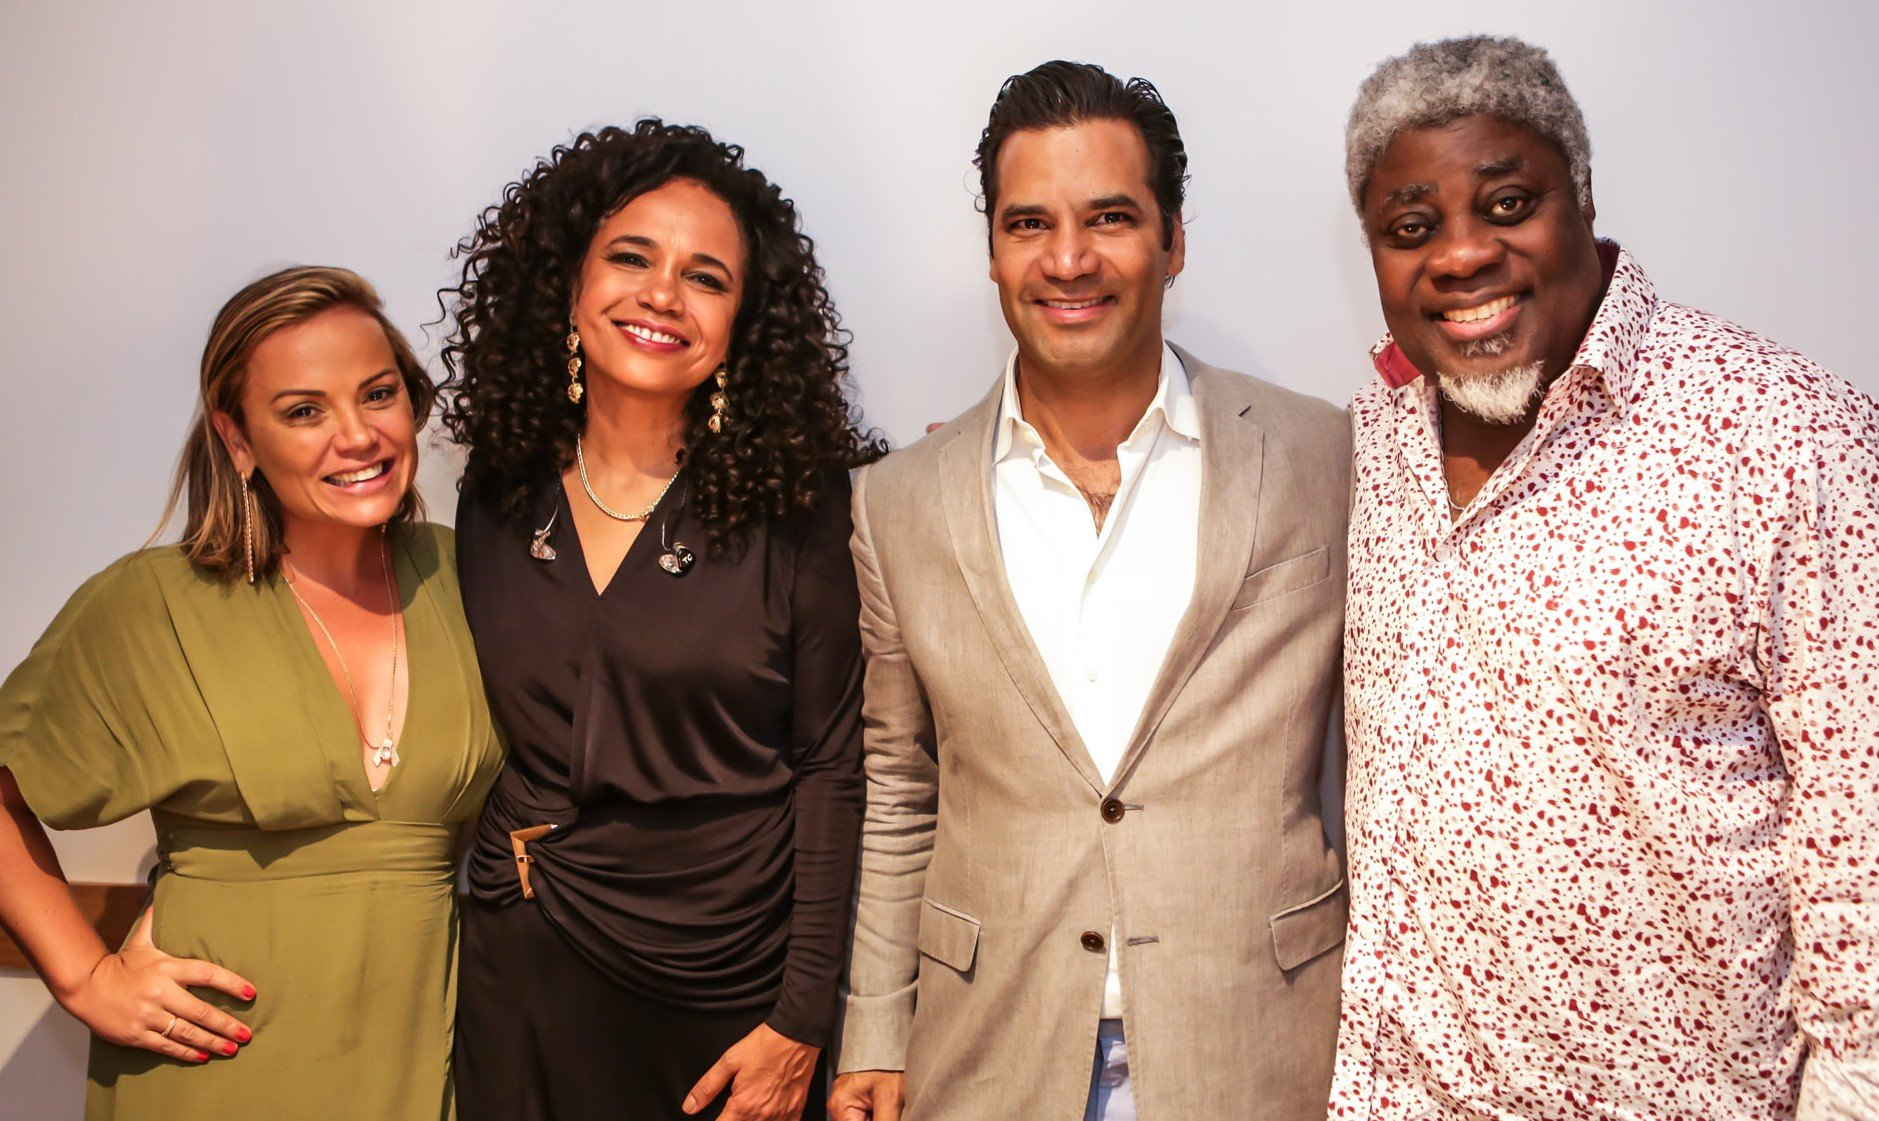 Paula Simonsen, Teresa Cristina, Gustavo Filgueiras e  Carlinhos 7 Cordas  /Foto: Gianne Carvalho